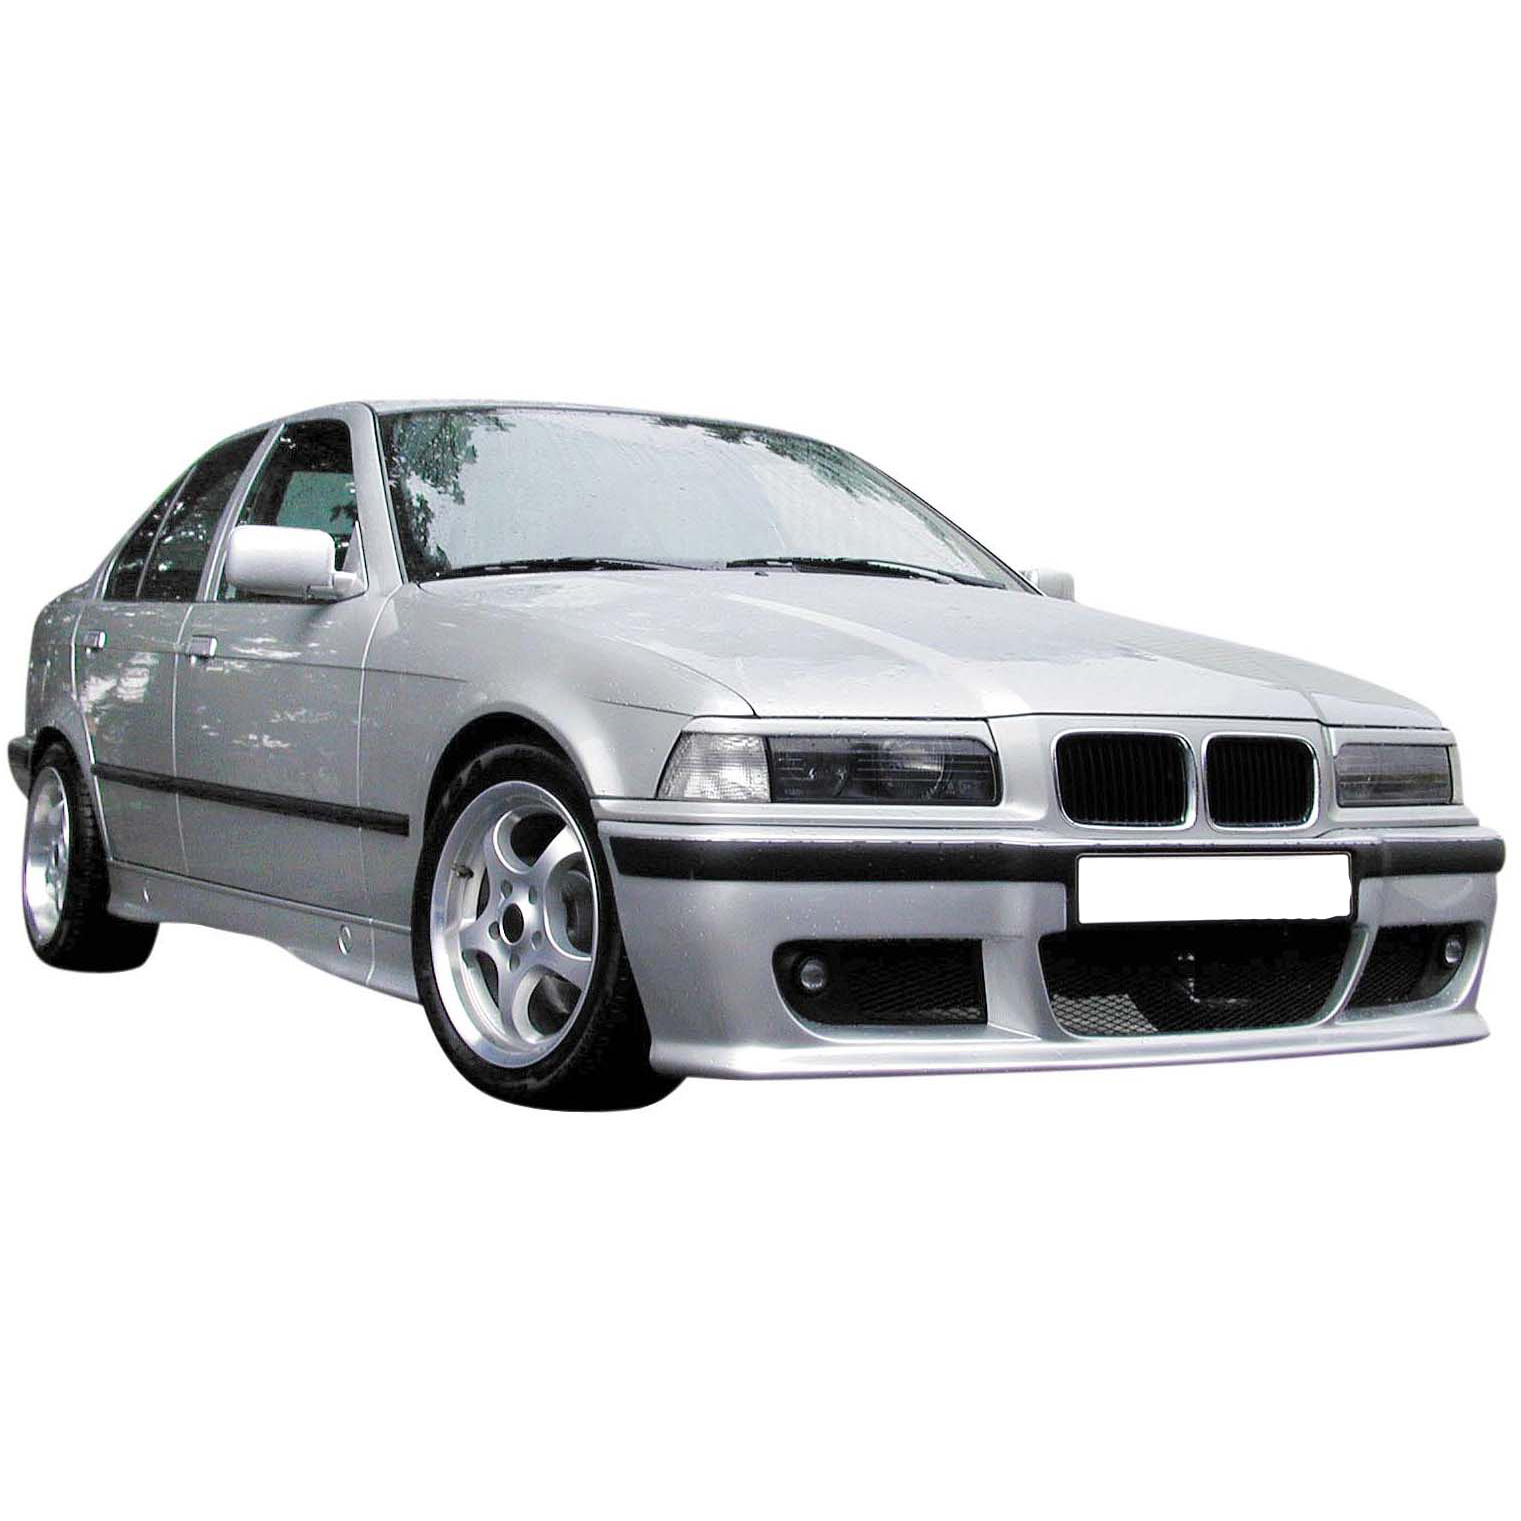 BMW 3 Series (E36) 1992-1999